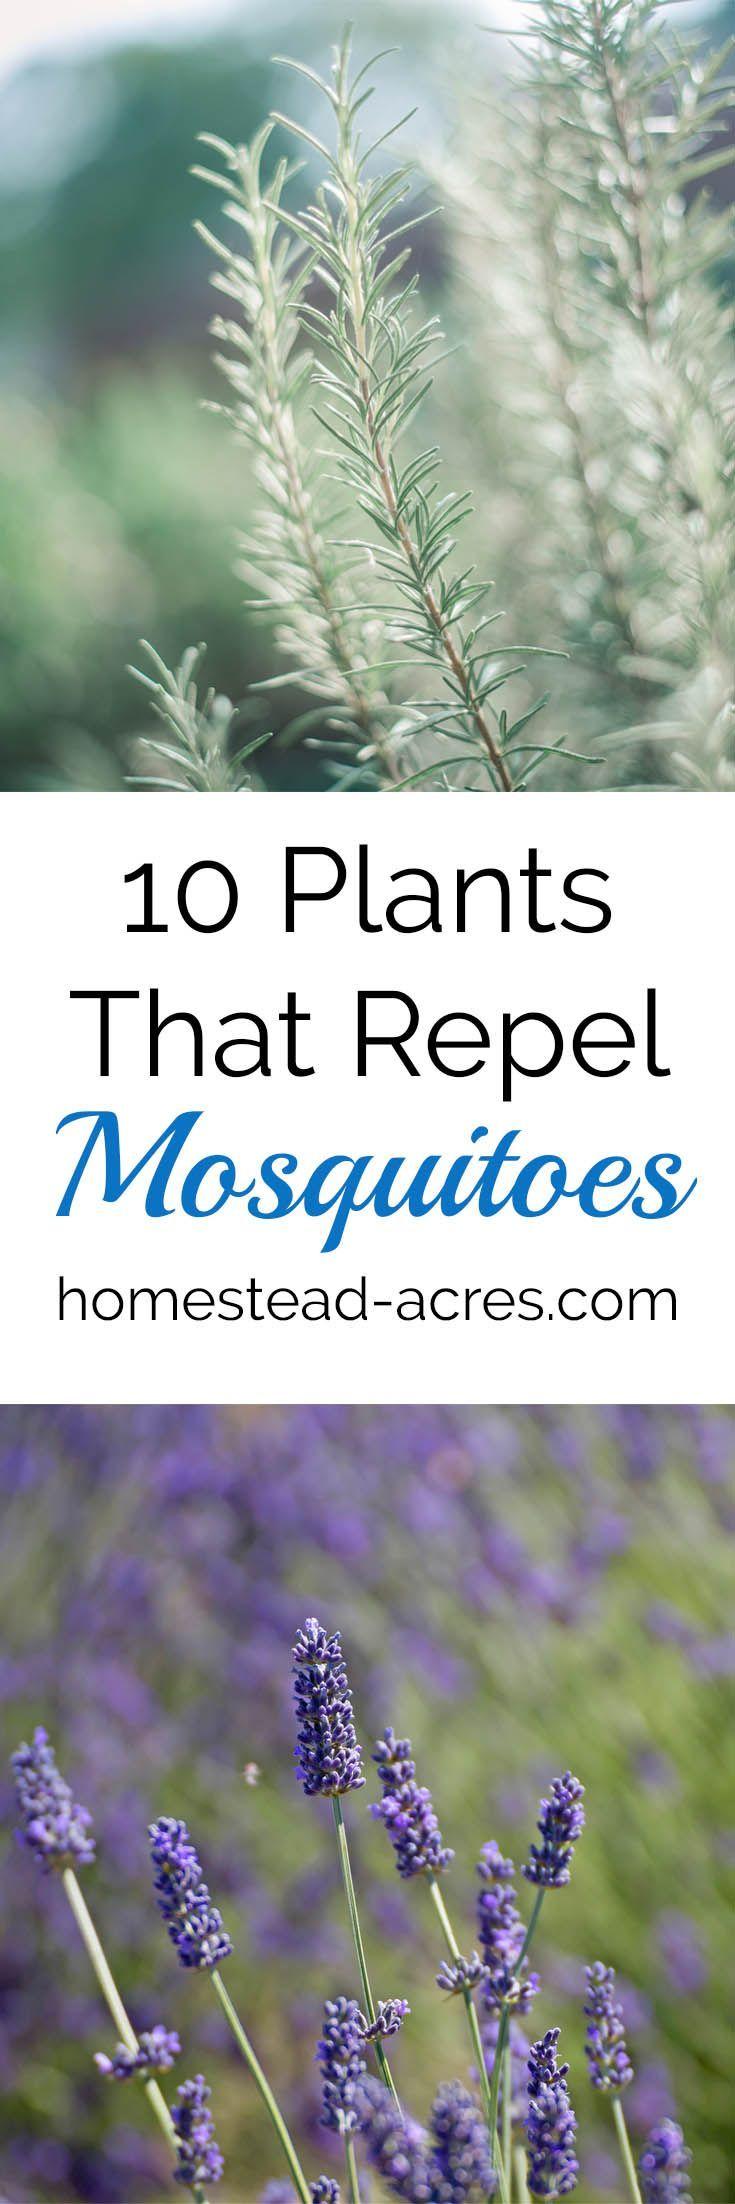 10 Plants That Repel Mosquitoes. Easy to grow flowers and herbs to help keep mosquitoes away. https://www.homestead-acres.com/10-plants-that-repel-mosquitoes/?utm_campaign=coschedule&utm_source=pinterest&utm_medium=Kim Mills | Homestead Acres | Homeschool